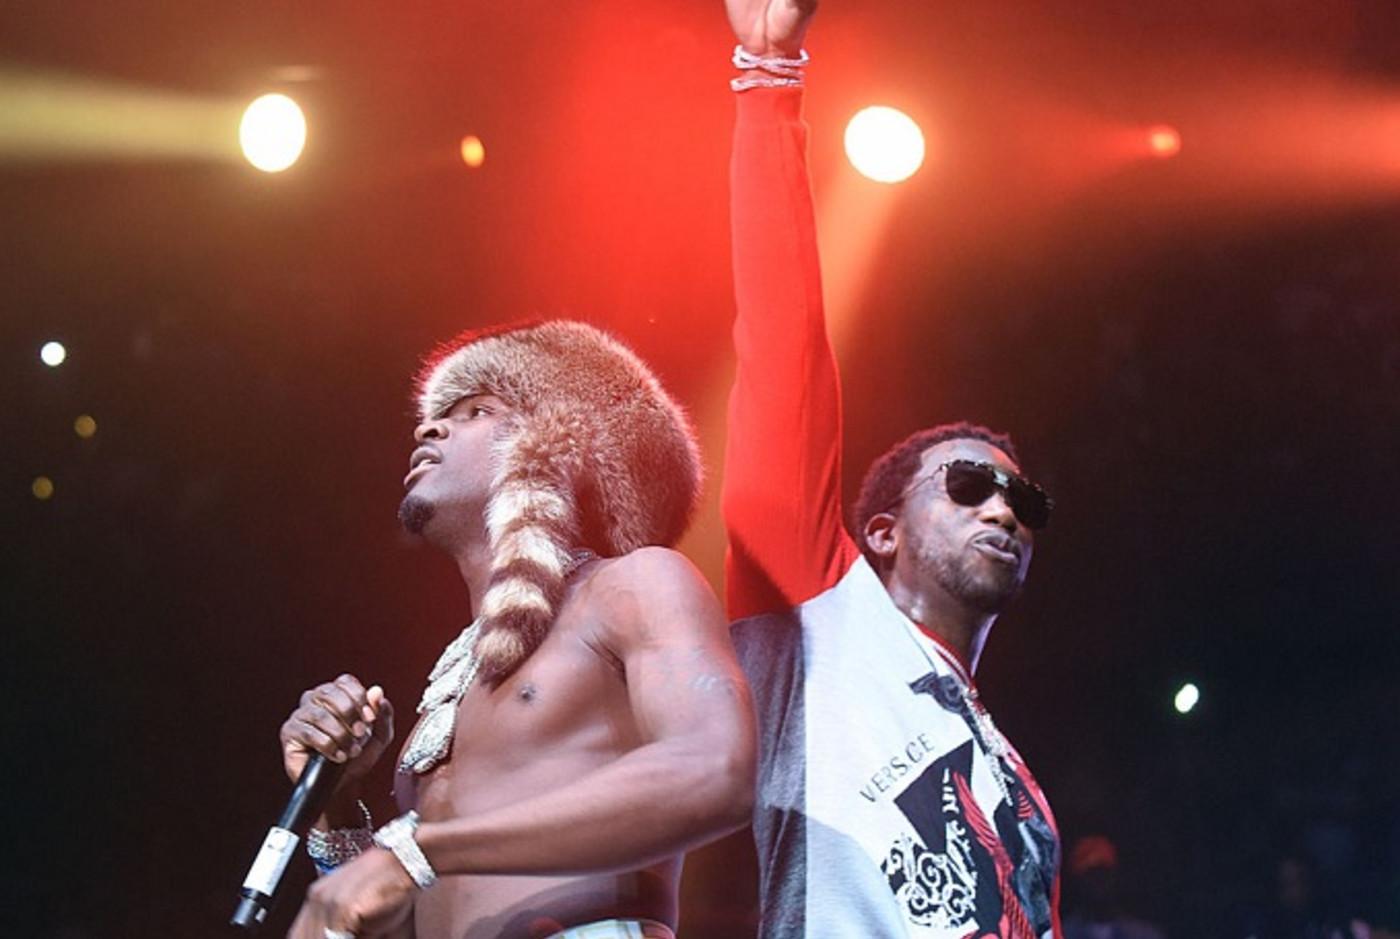 Ralo and Gucci Mane